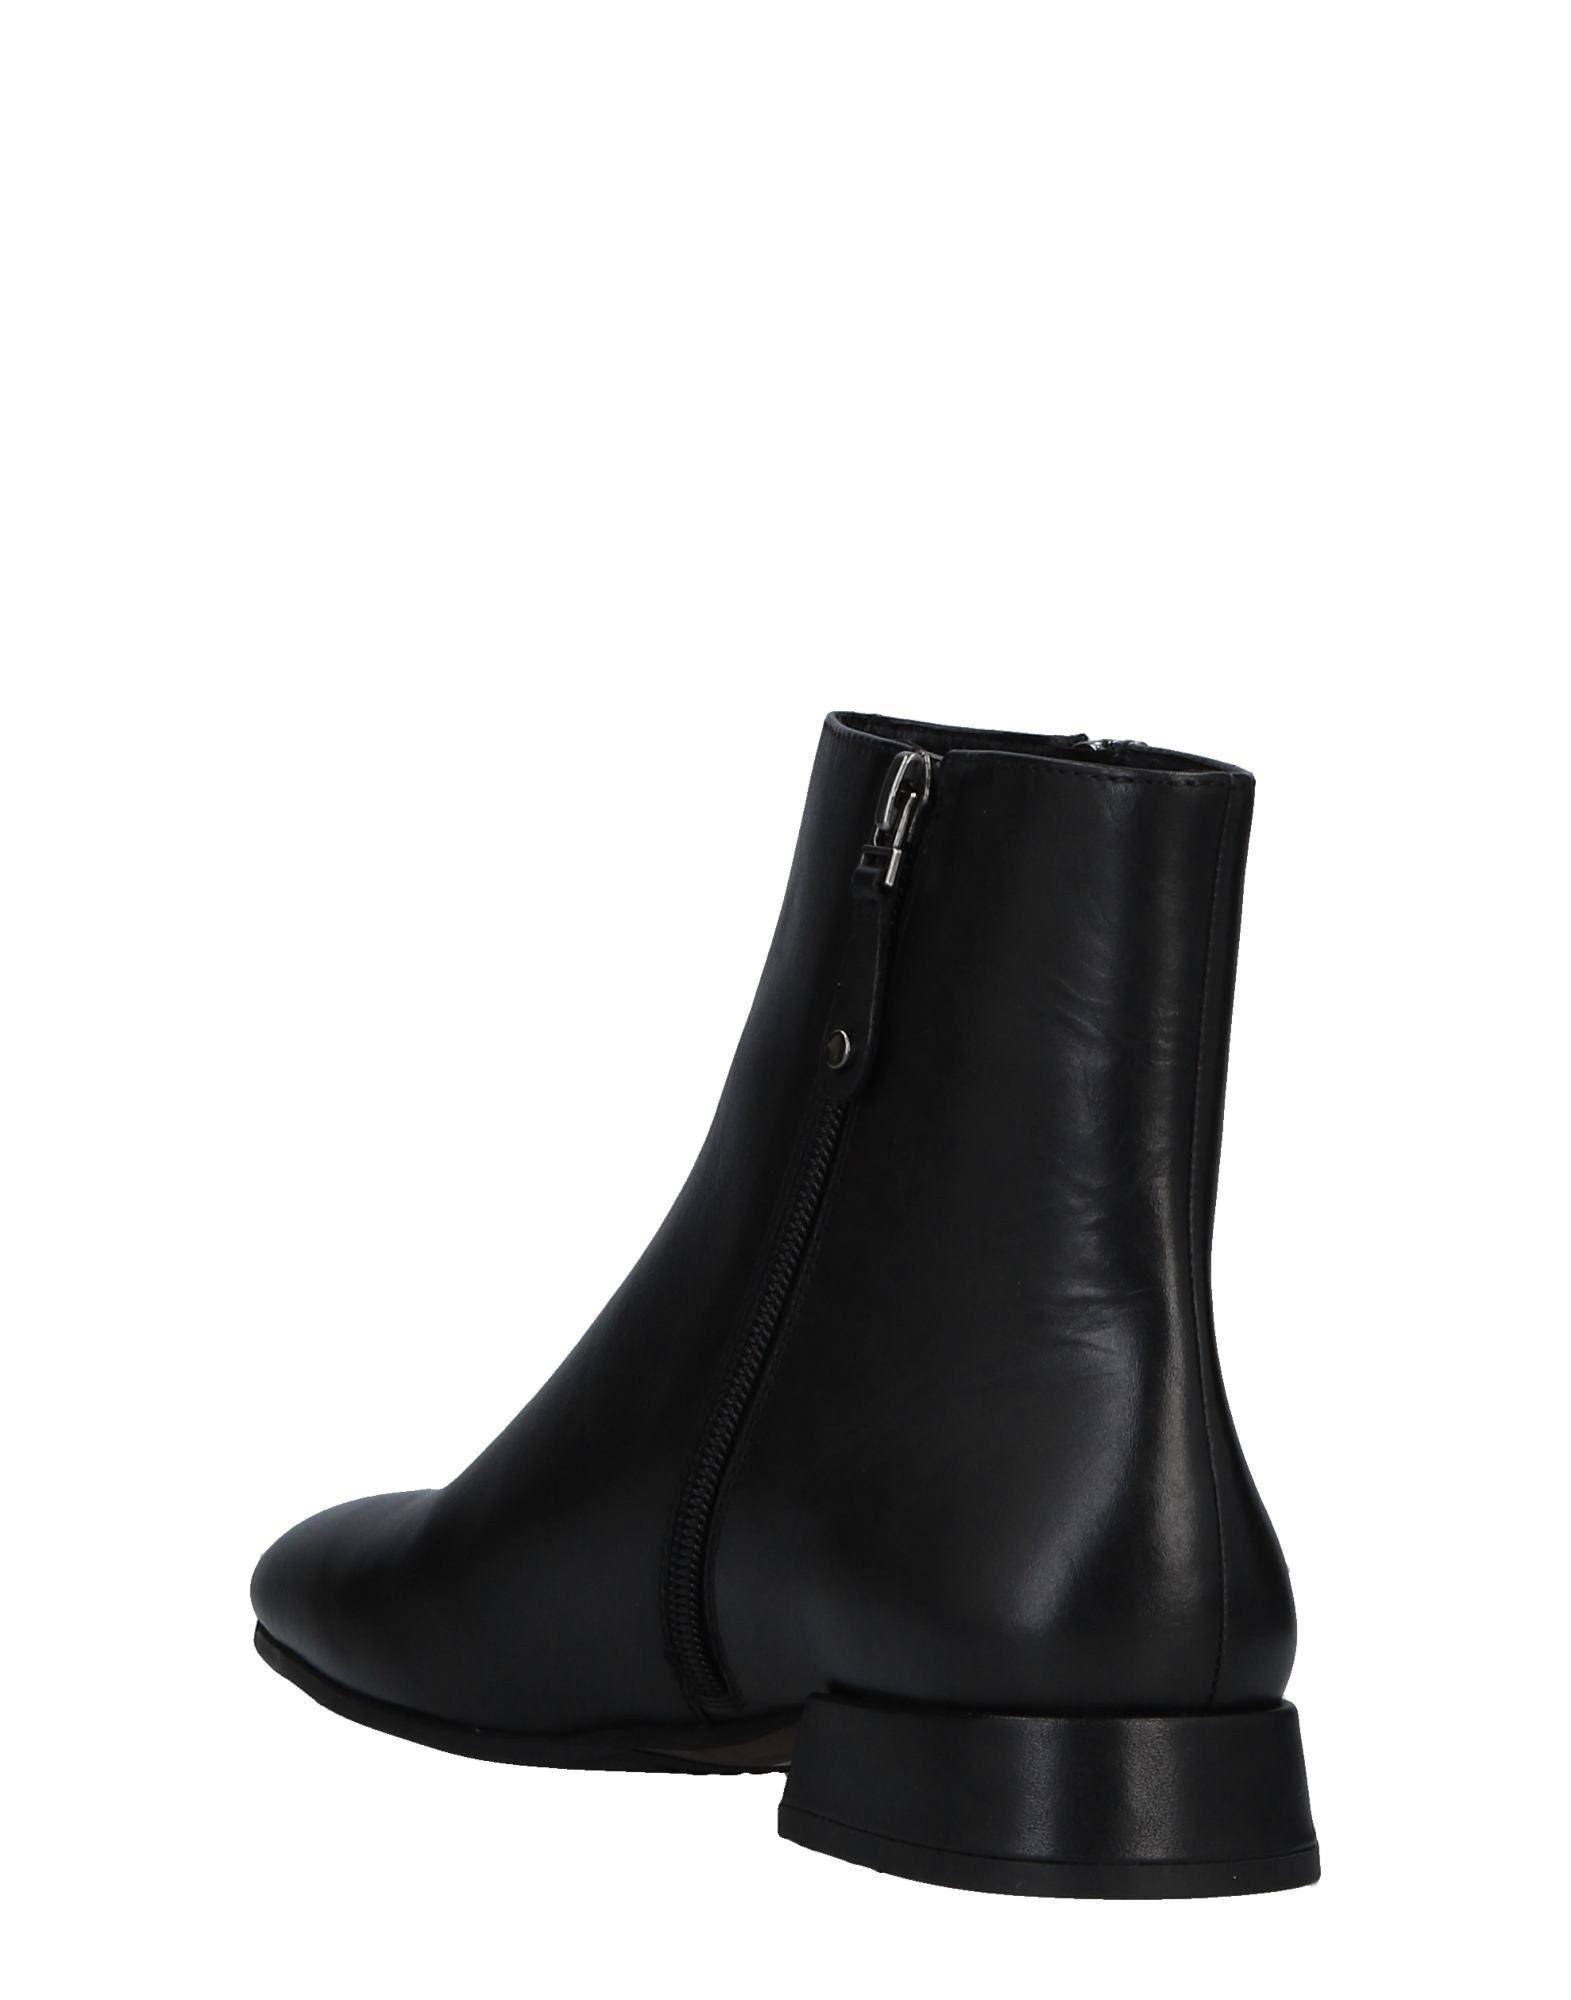 Cris Vergré Stiefelette Damen  11512301QJ Gute Qualität beliebte Schuhe